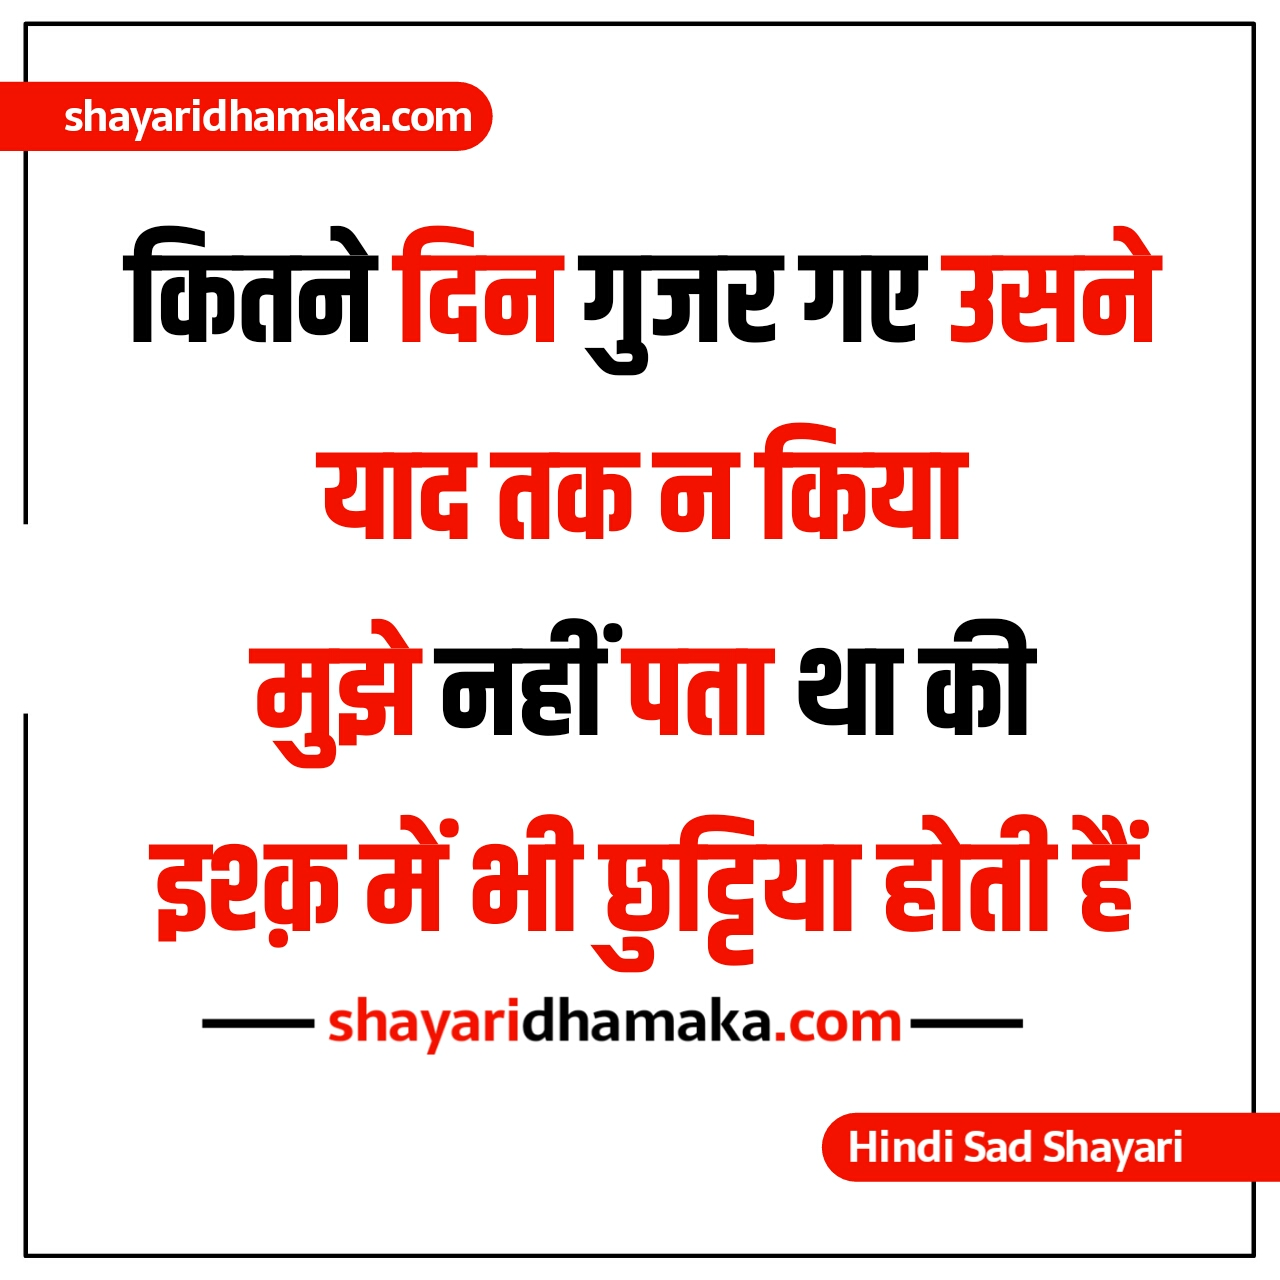 कितने दिन गुजर गए उसने - Hindi Sad Shayari